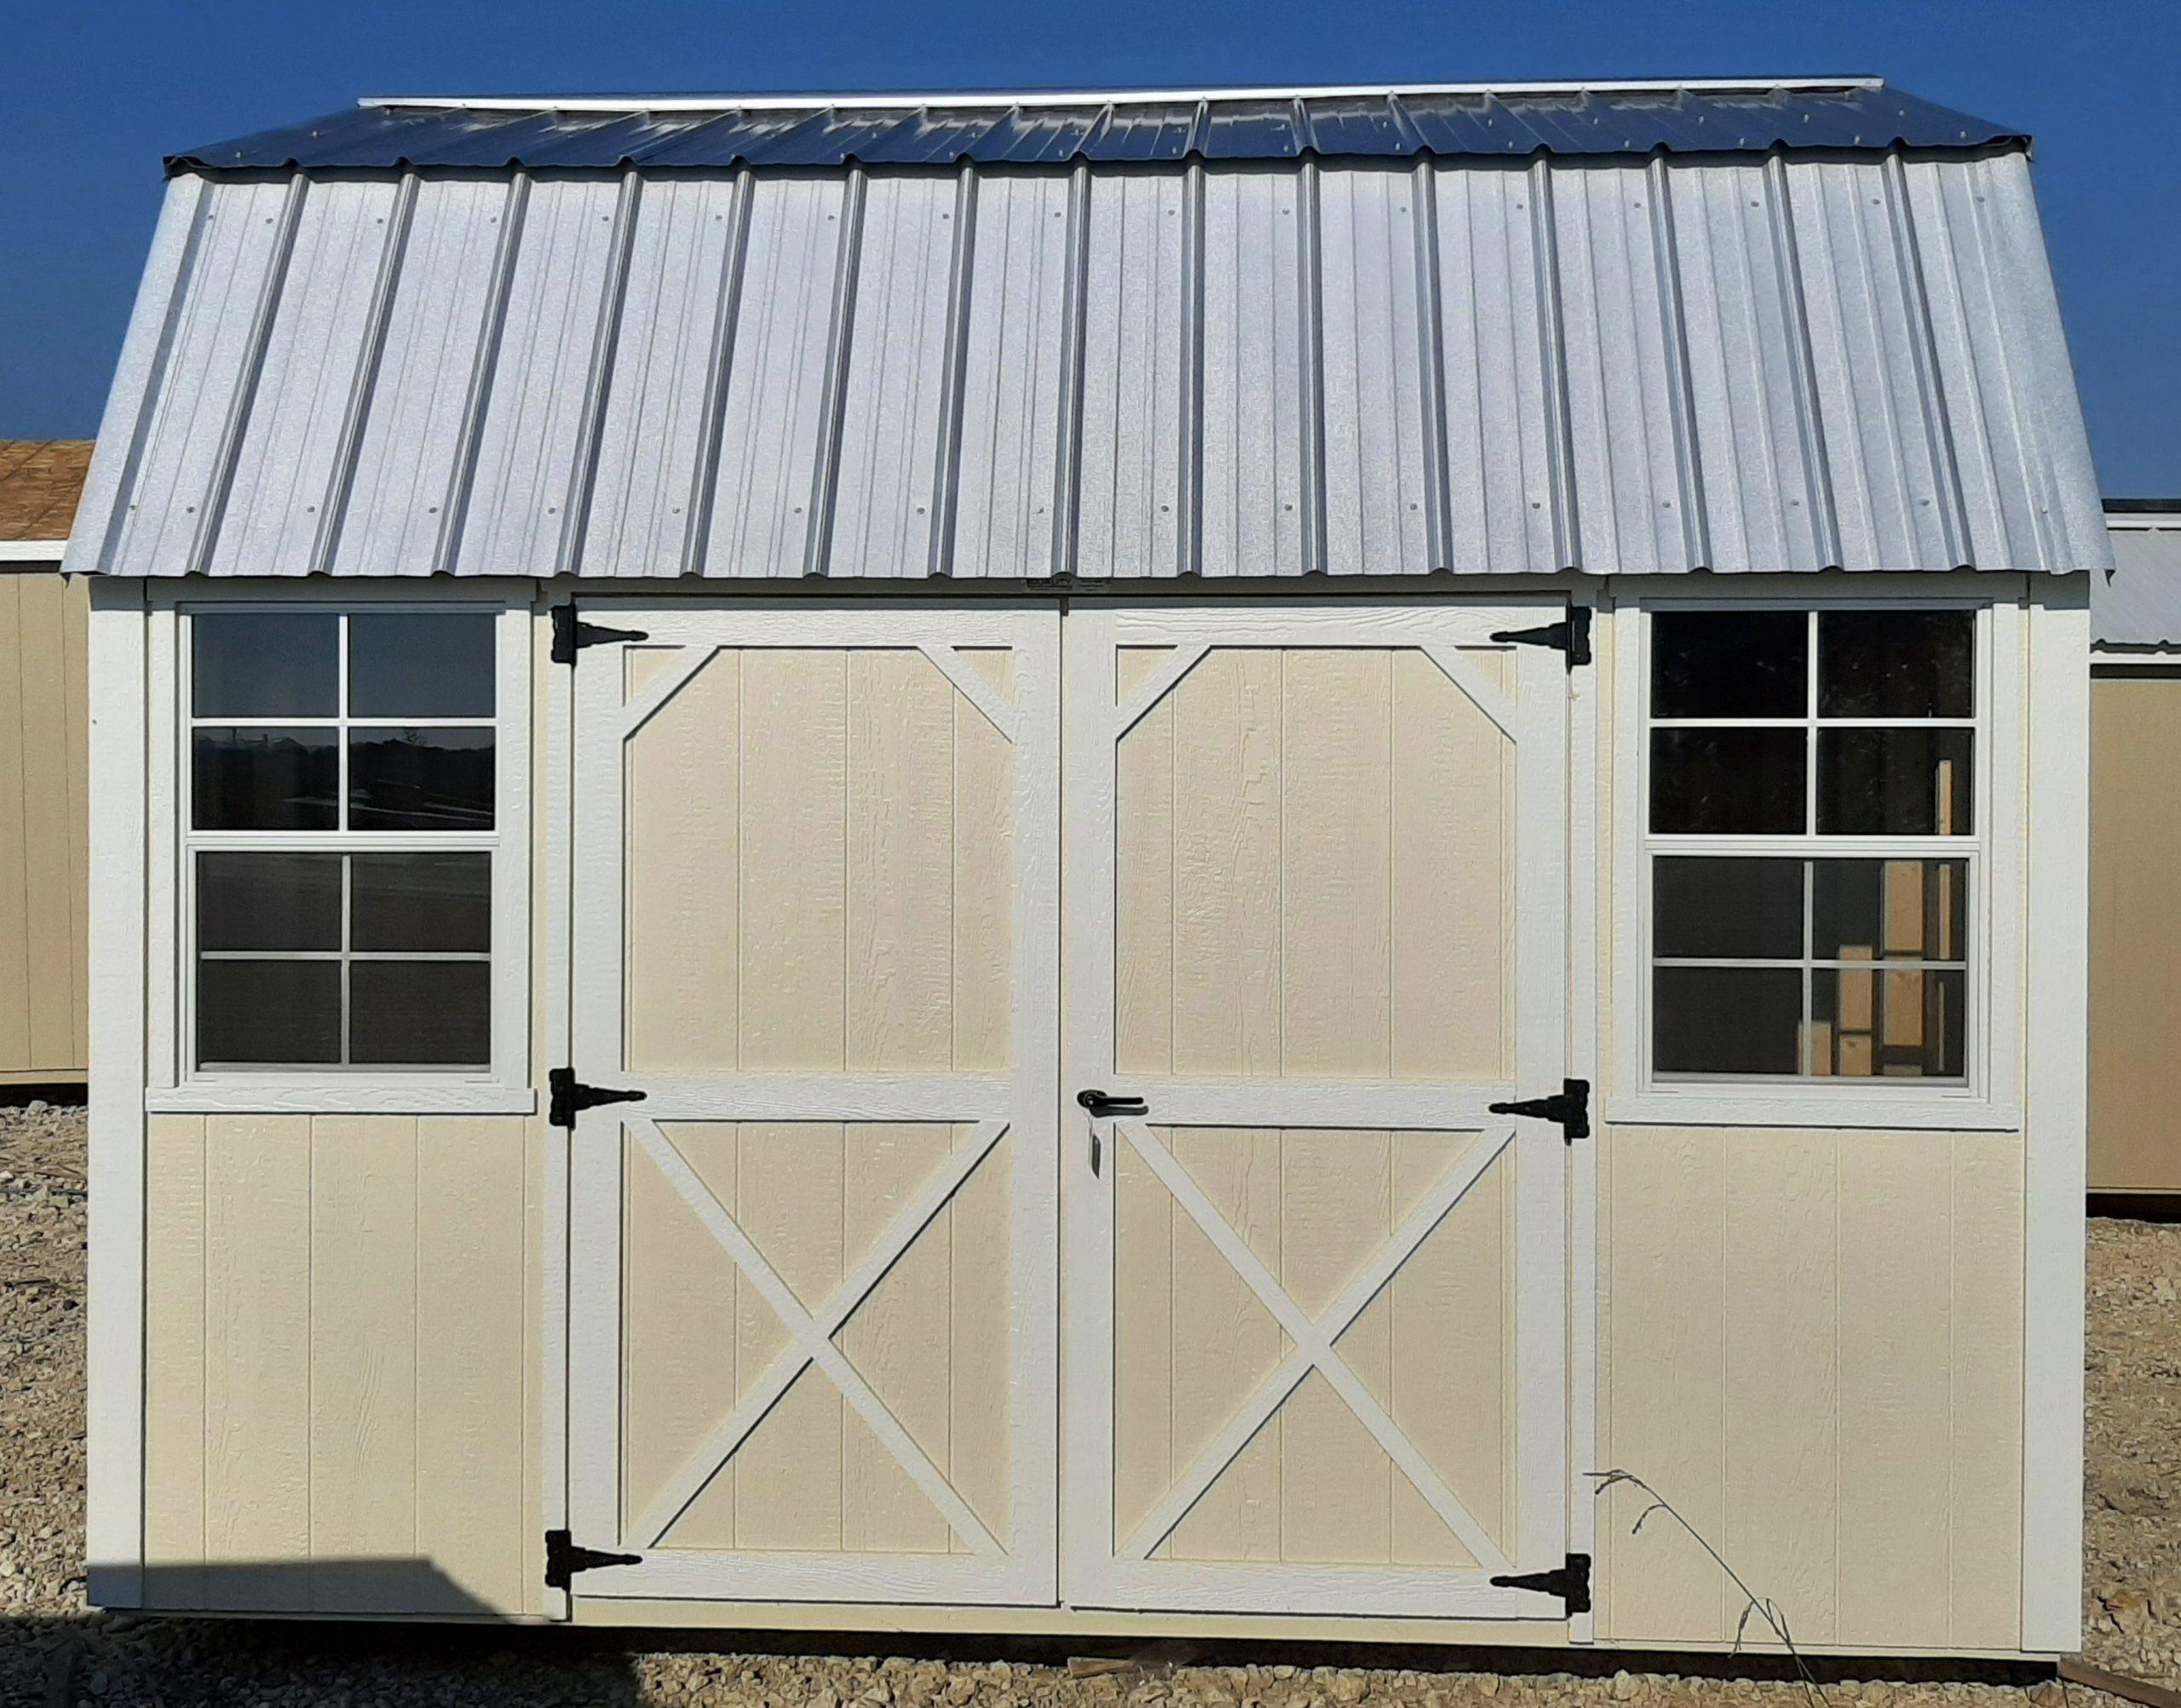 10x12 Lofted Barn #2165 Image